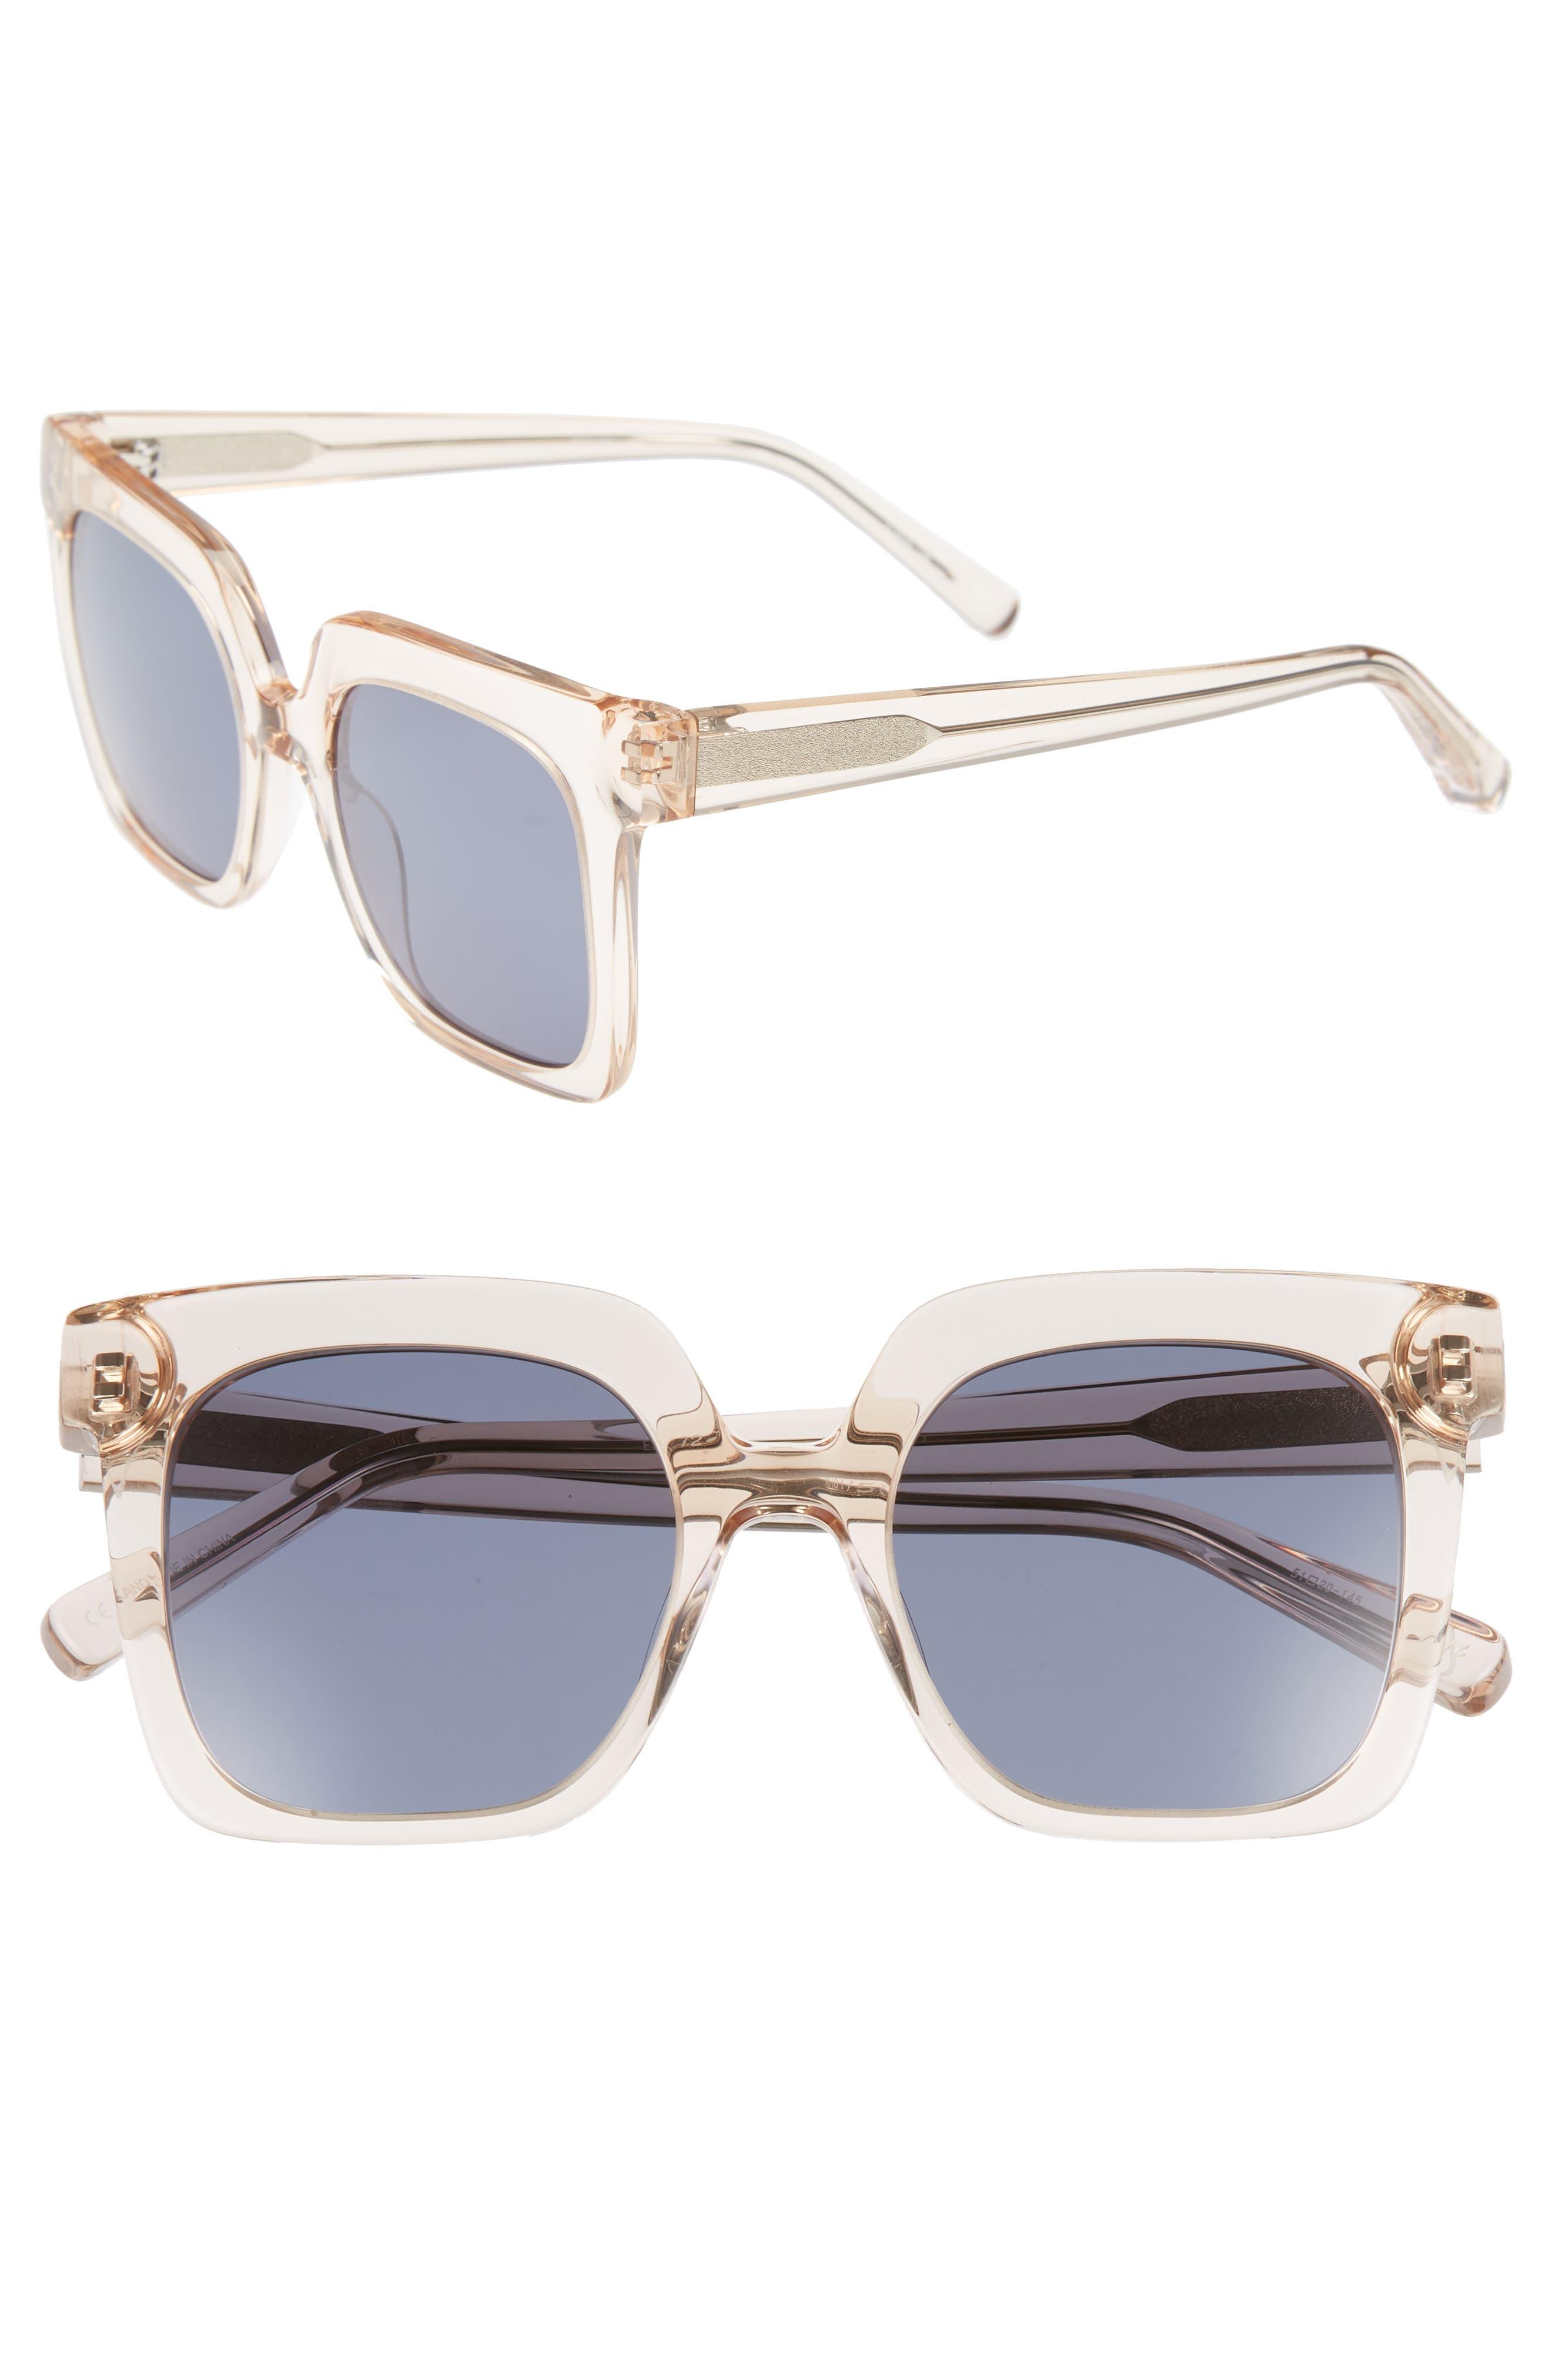 Rae 51mm Square Sunglasses,                             Main thumbnail 2, color,